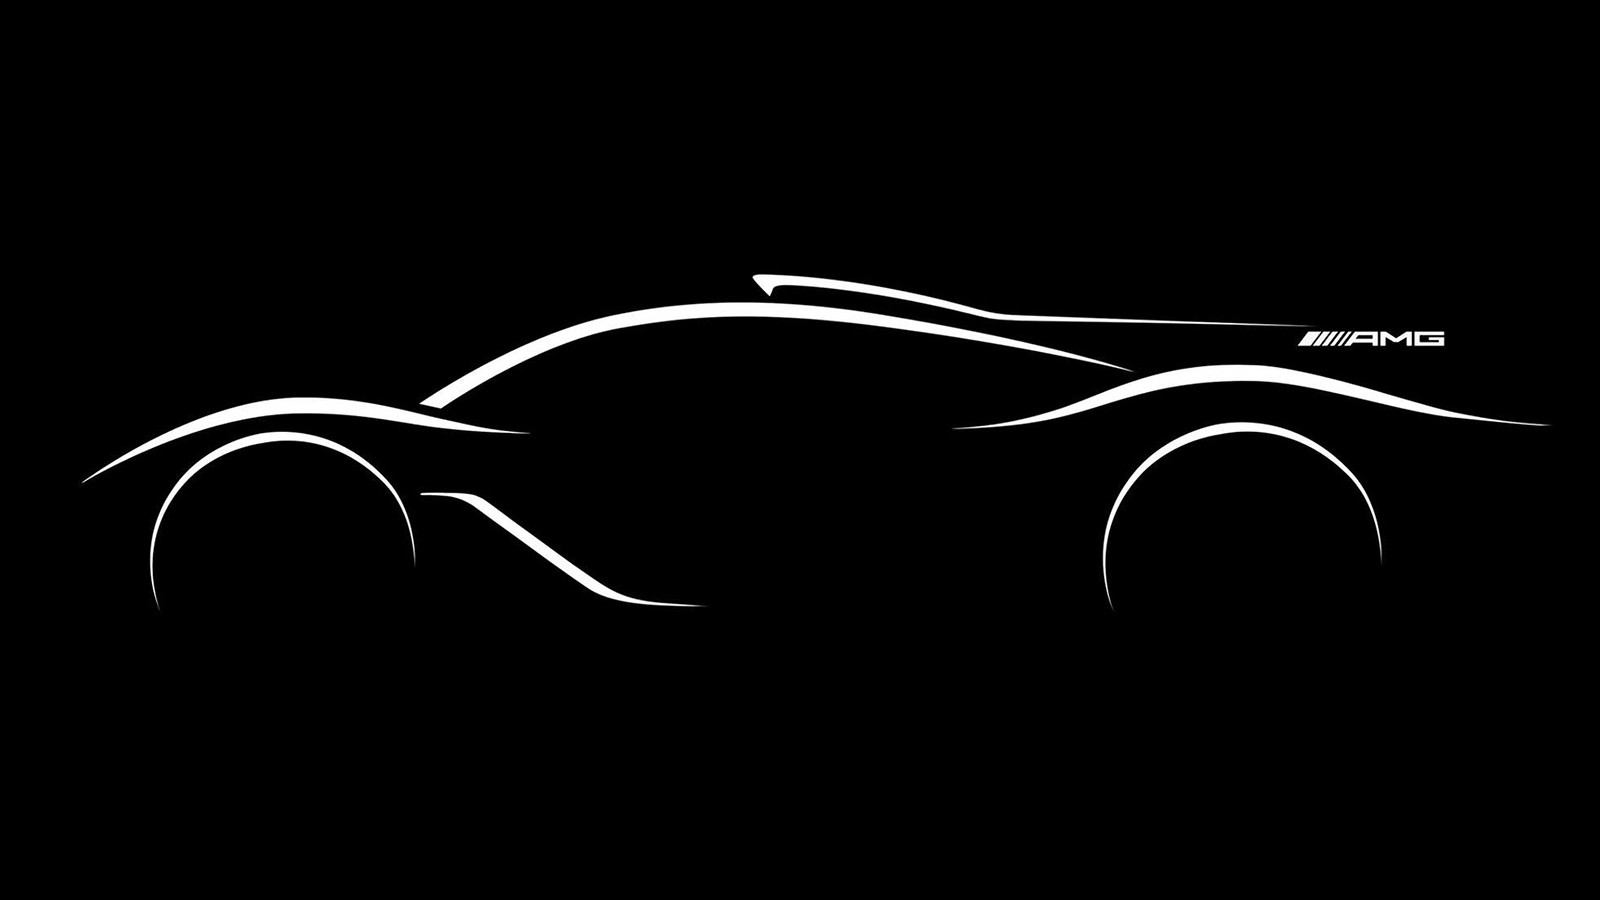 Тизер нового гиперкара Mercedes-AMG